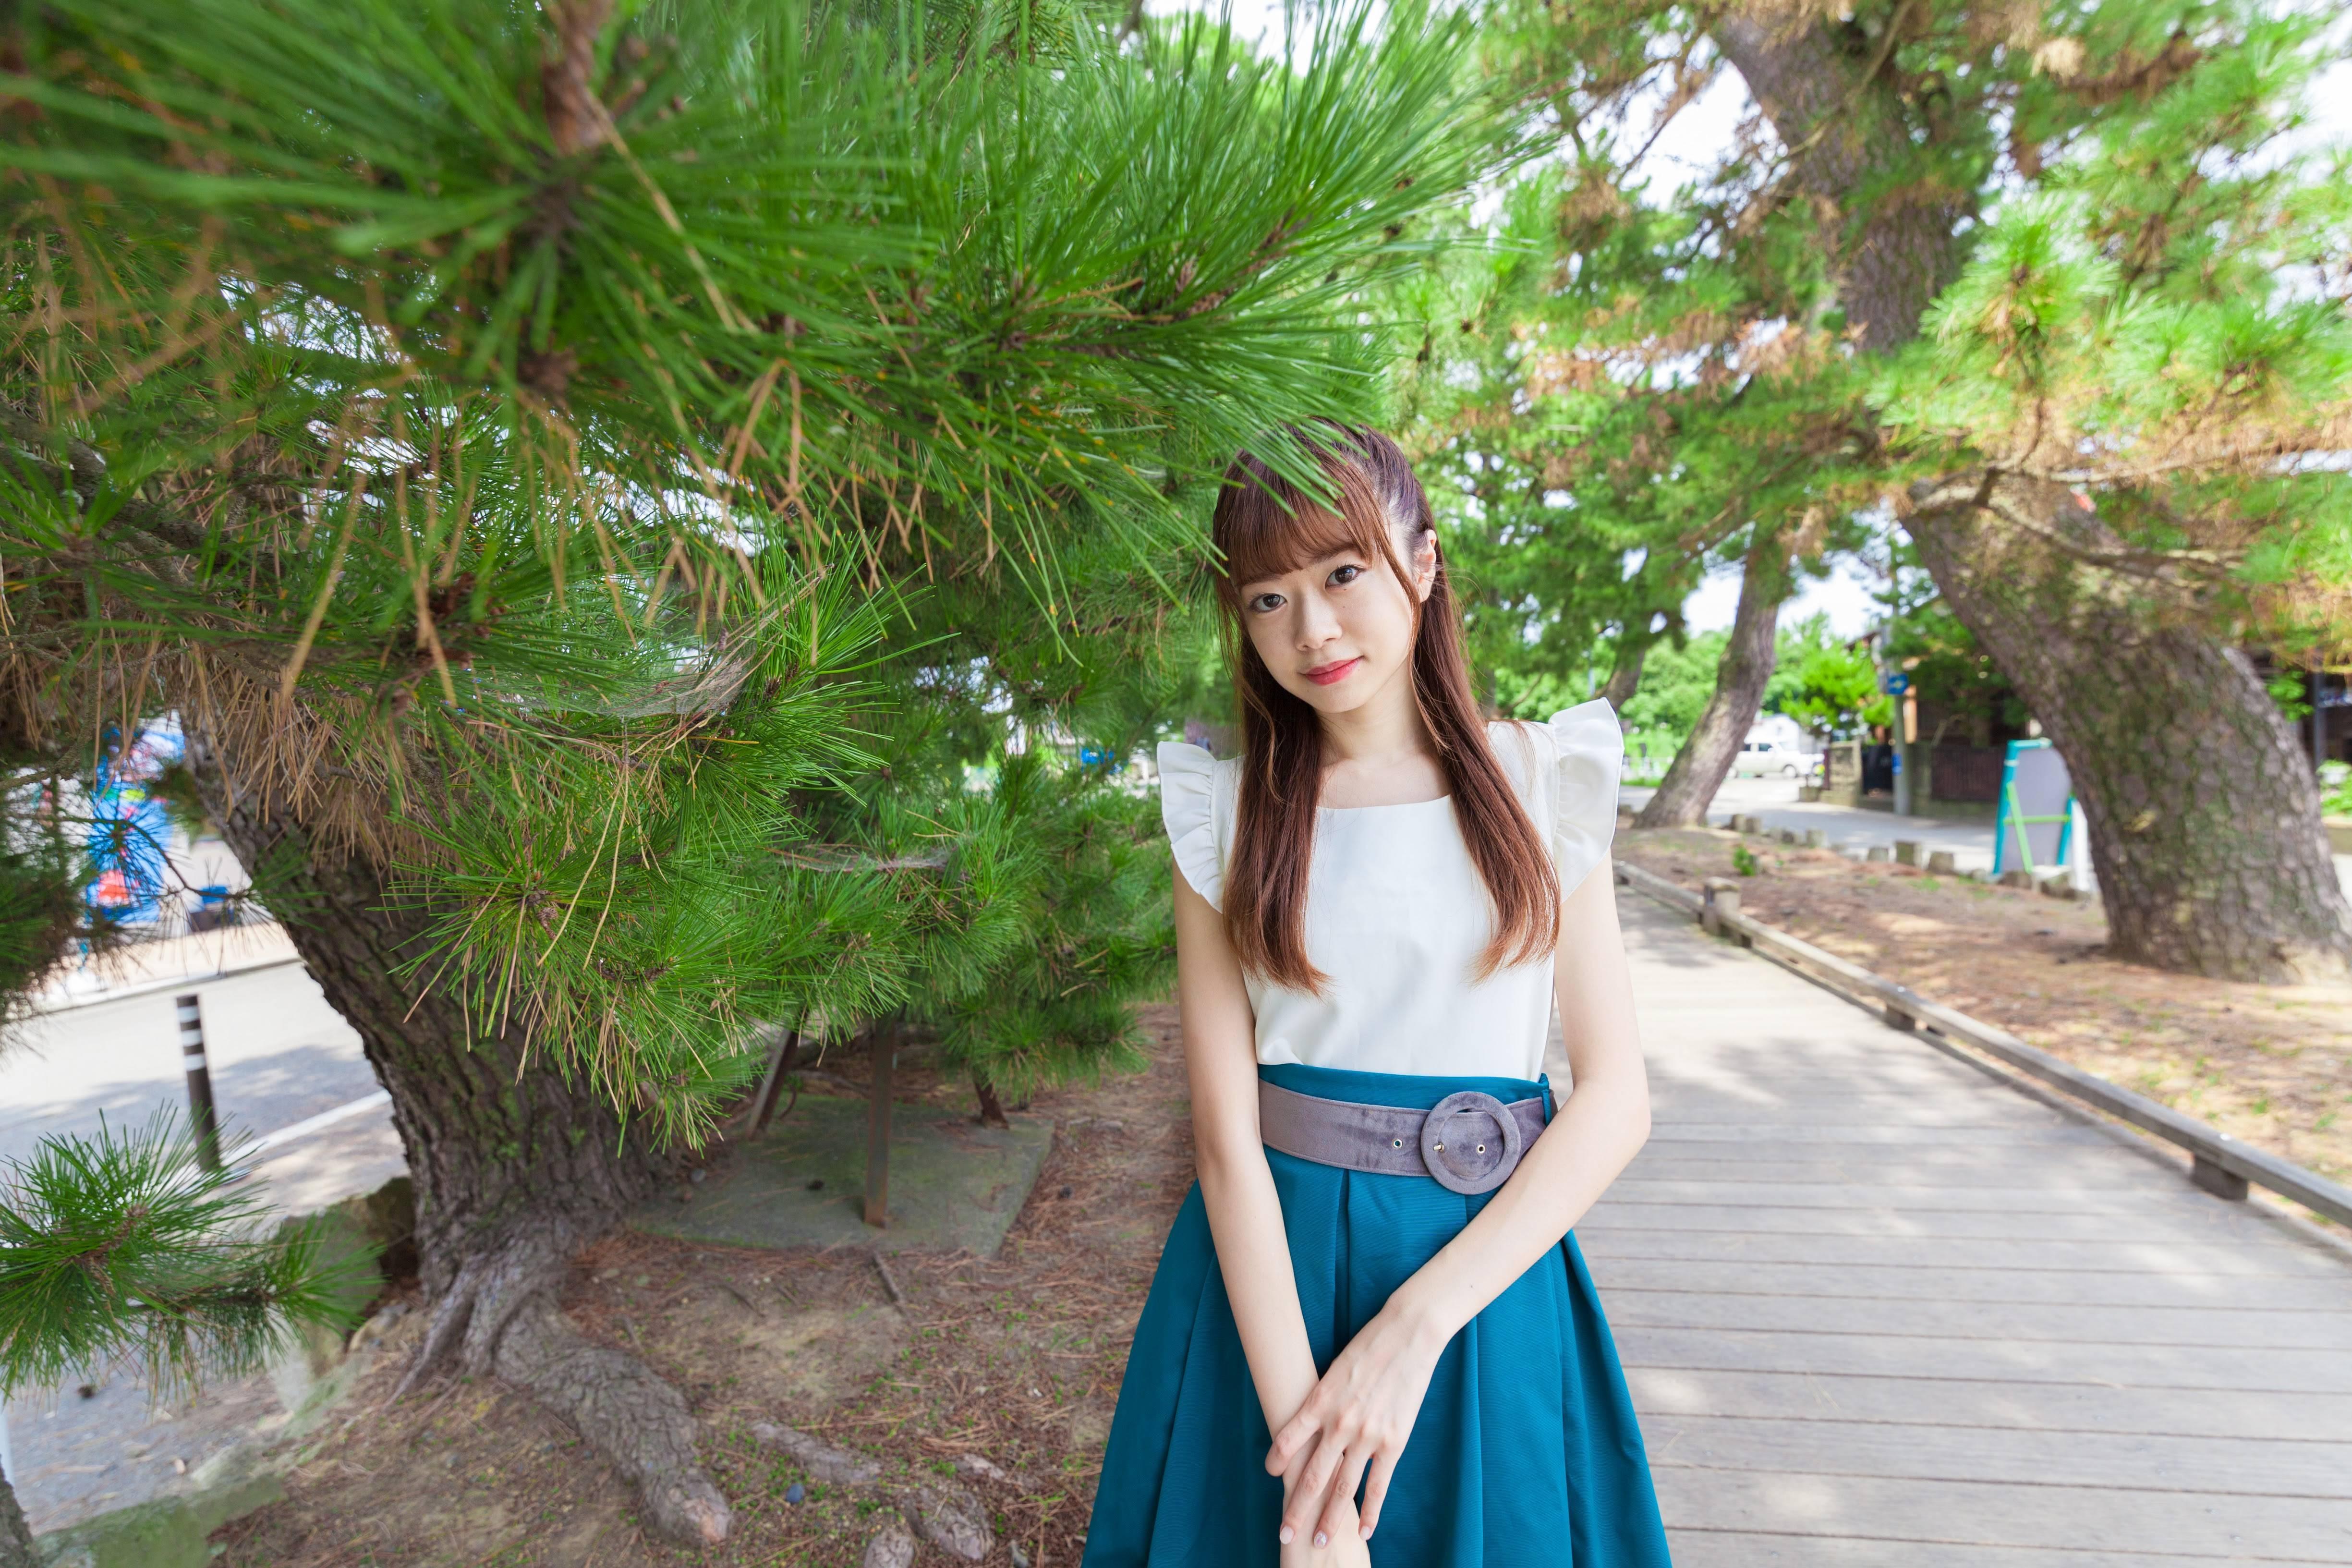 Vol.21♡ 【2017秋コーデ】身長150cm台が着こなす《フレアースカート》_1_2